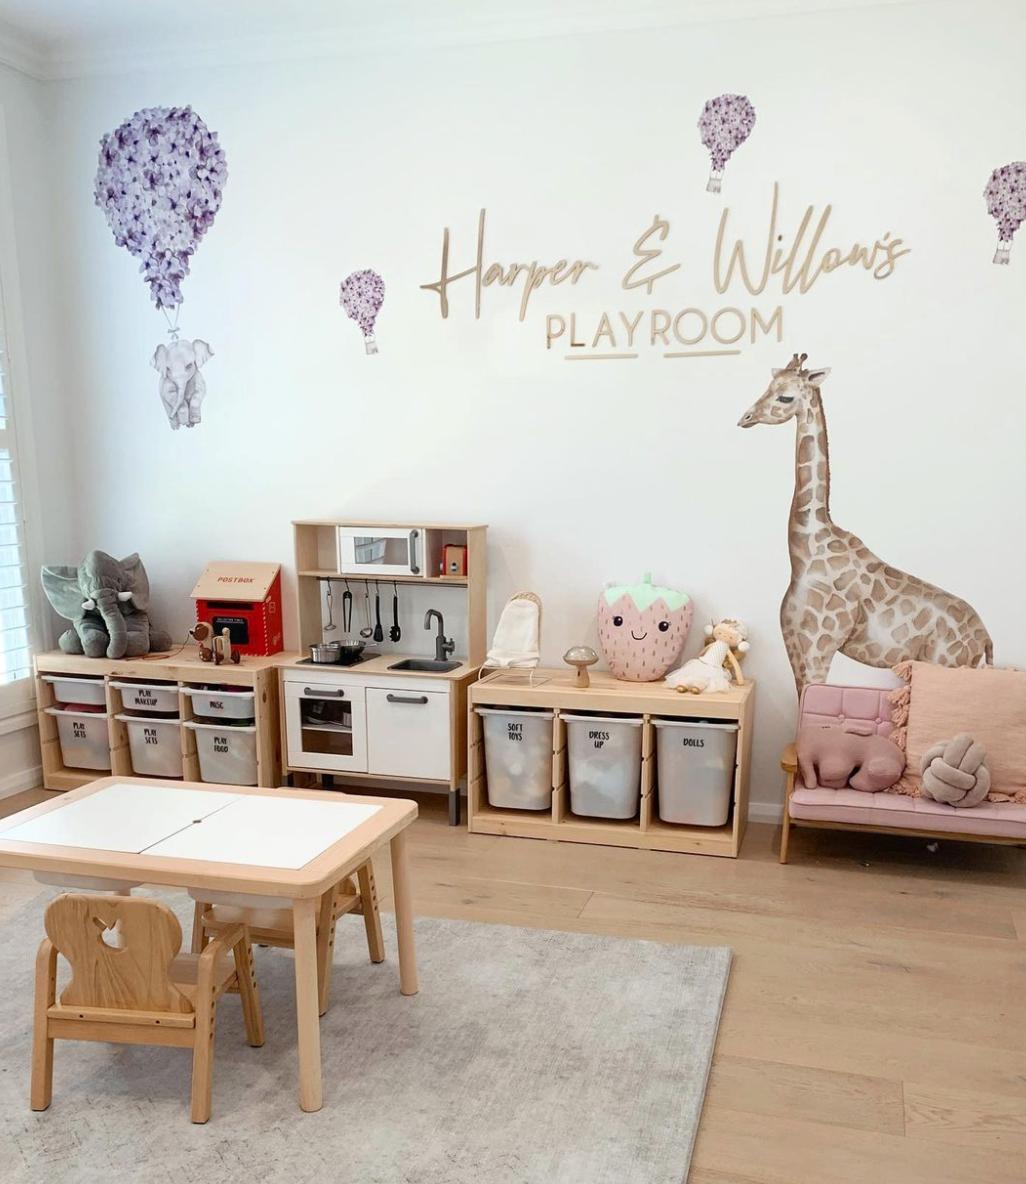 Playroom storage and decoration ideas